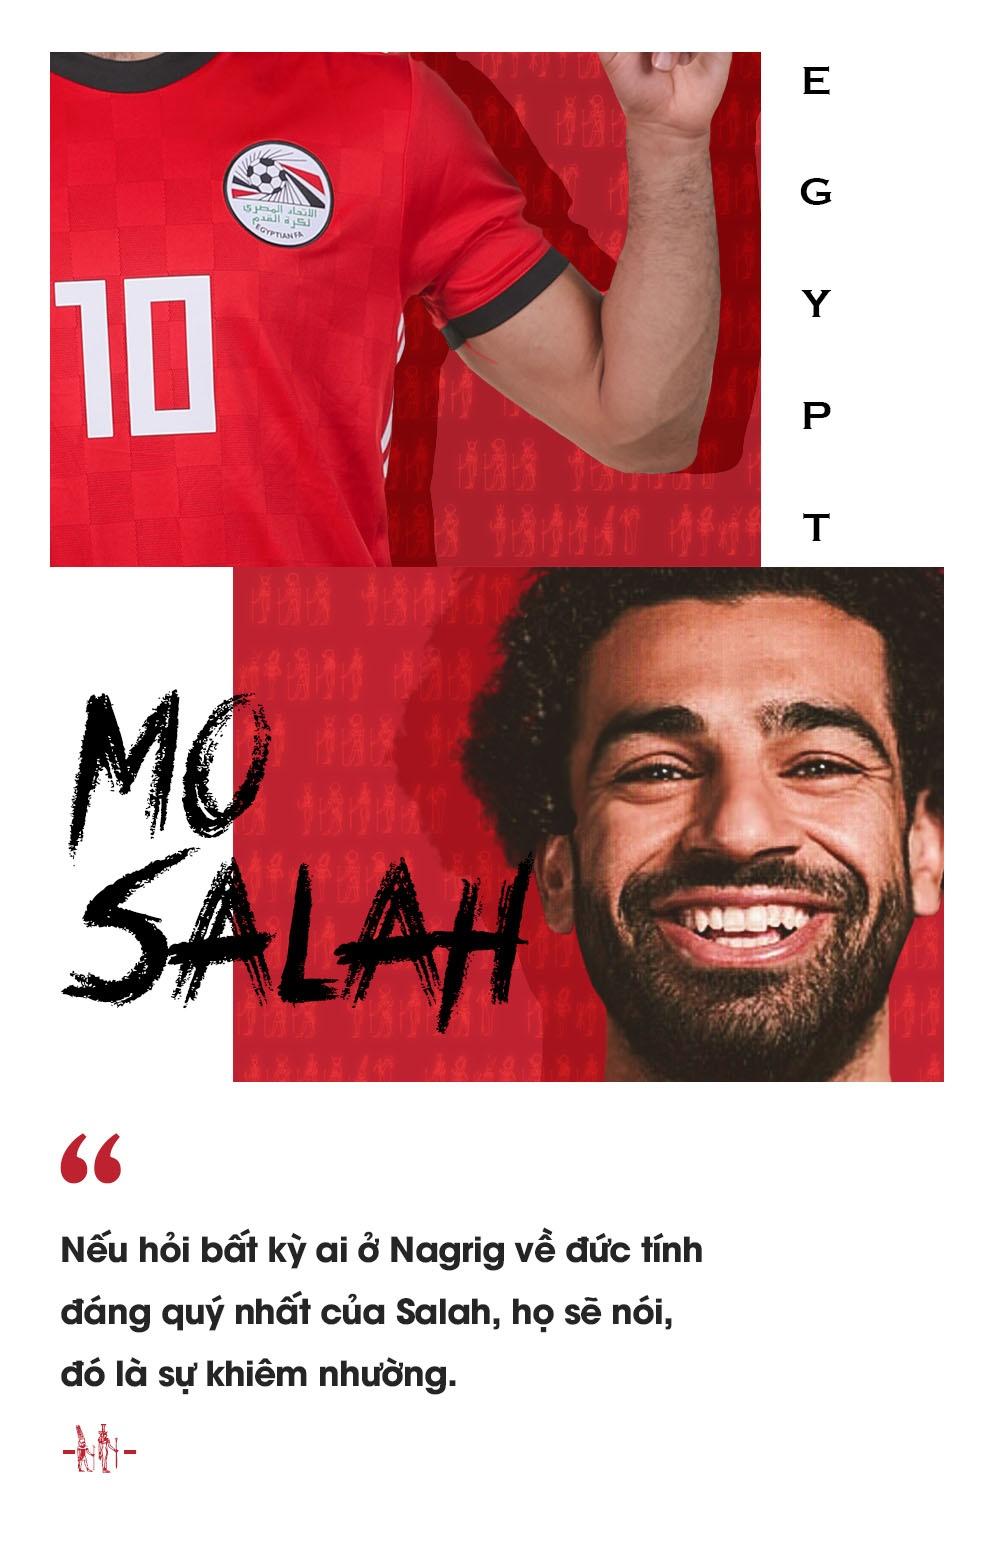 Mohamed Salah - Vua cua cac vi than hinh anh 8